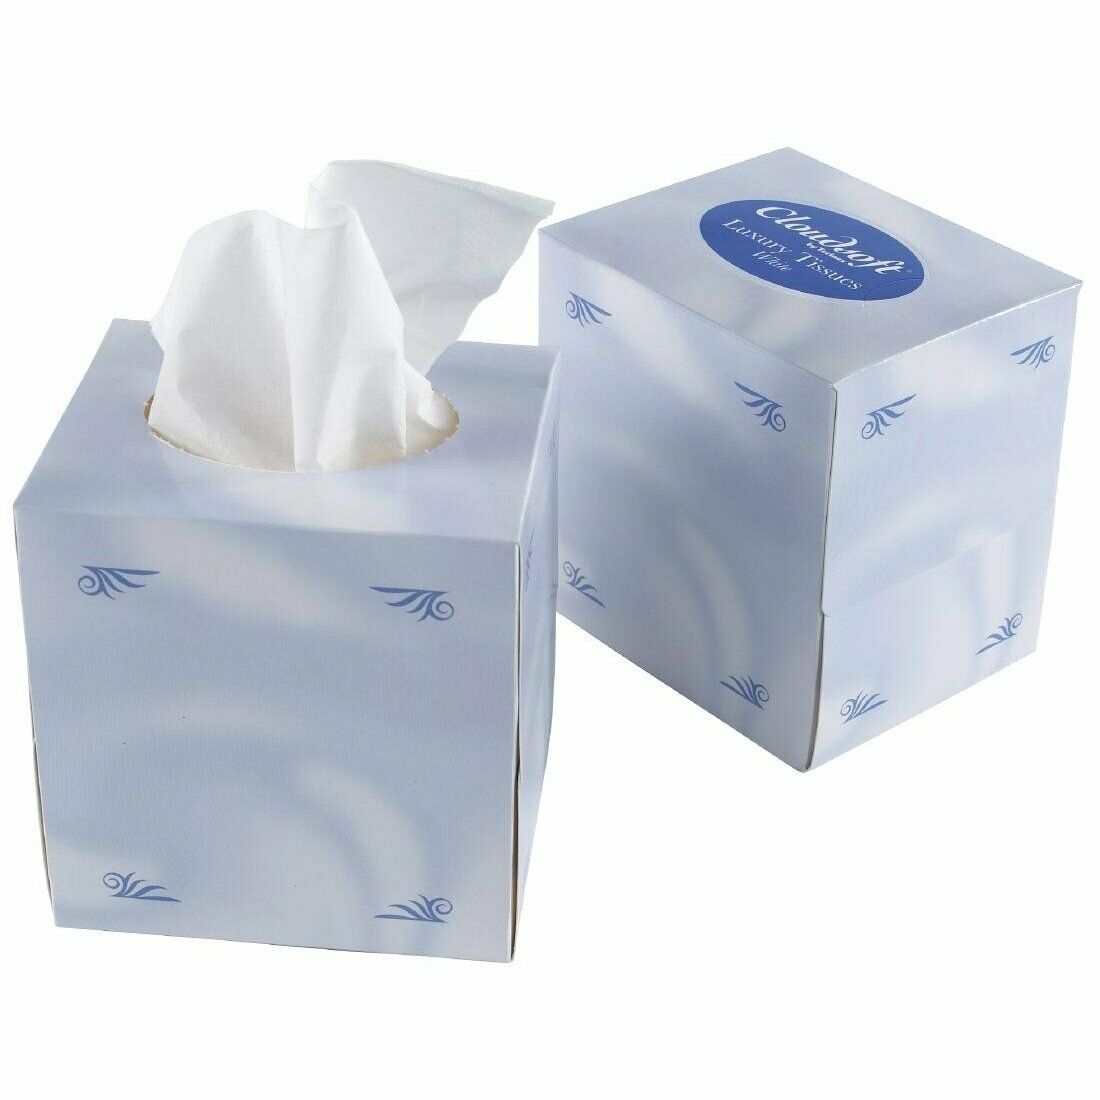 Facial Tissue - 24Pk - Buy 2 Get 1 Free!